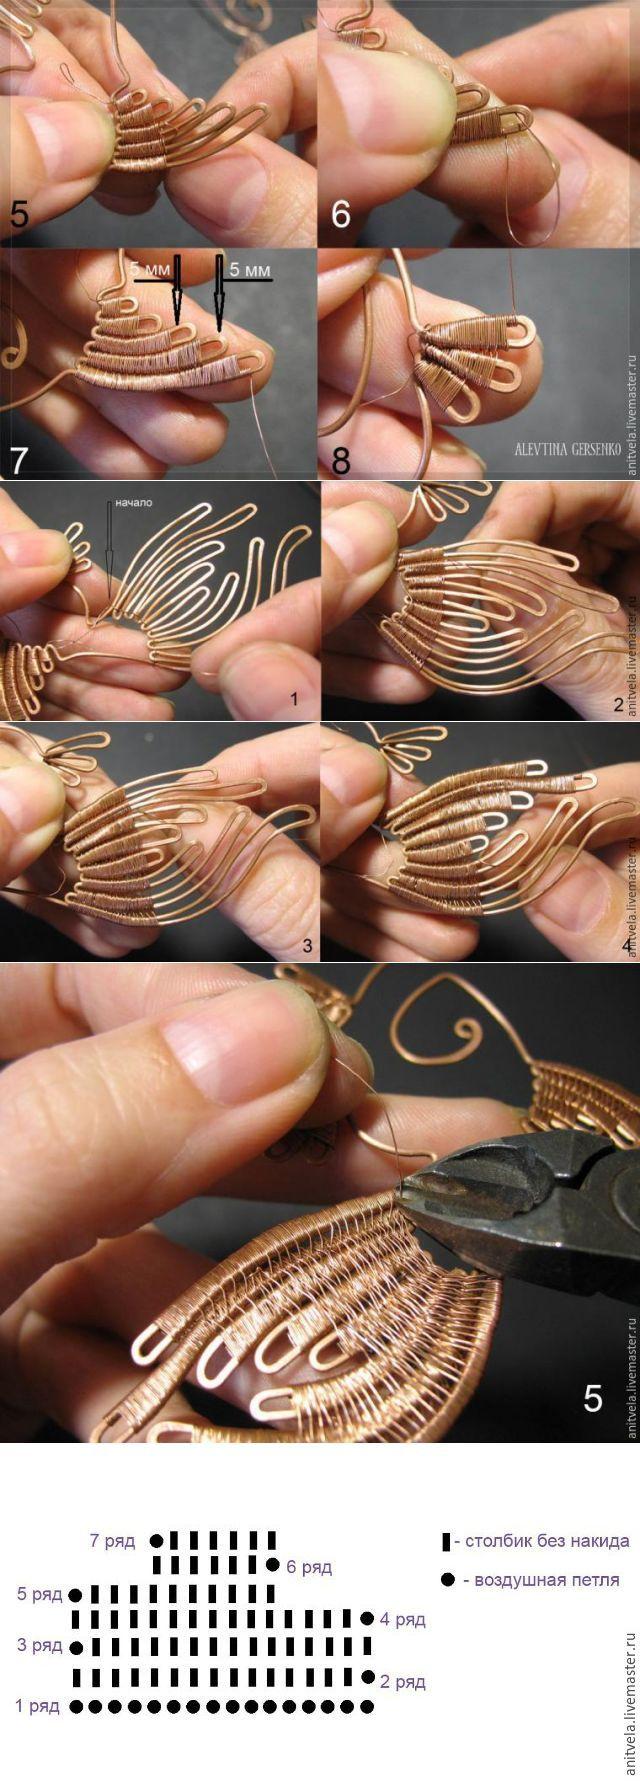 Мастер-класс: колье «Рыбы» в технике wire work - Ярмарка Мастеров - ручная работа, handmade